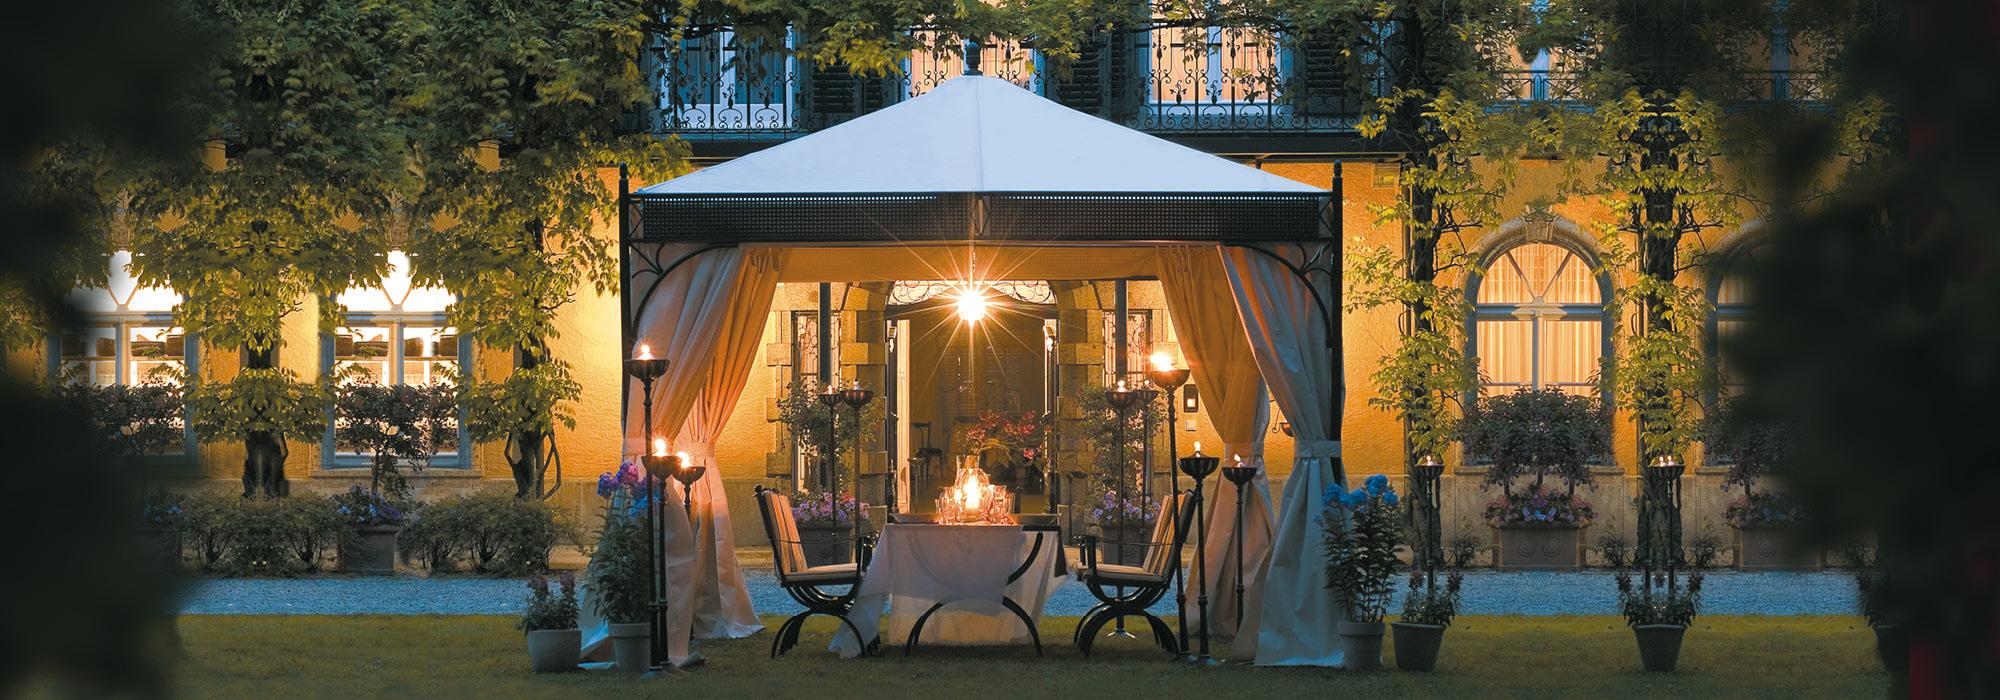 Pavillon Romeo